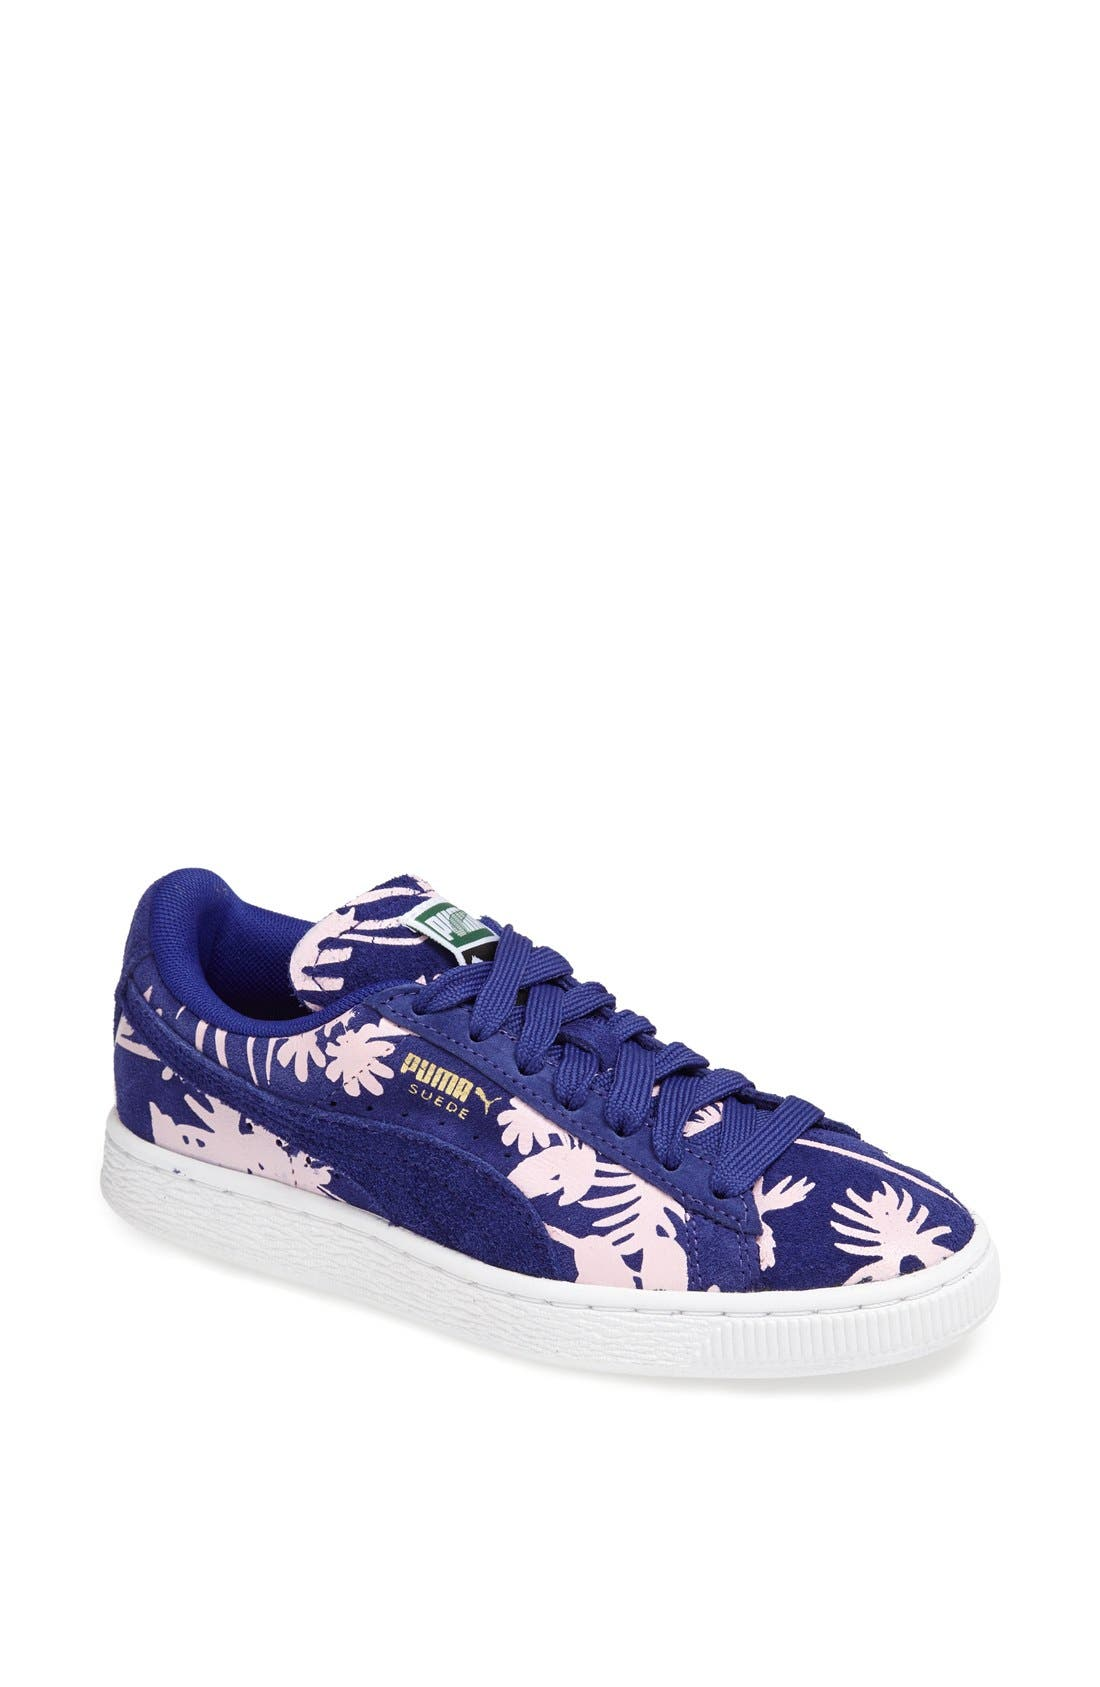 Main Image - PUMA 'Suede Classic Tropicalia' Sneaker (Women)